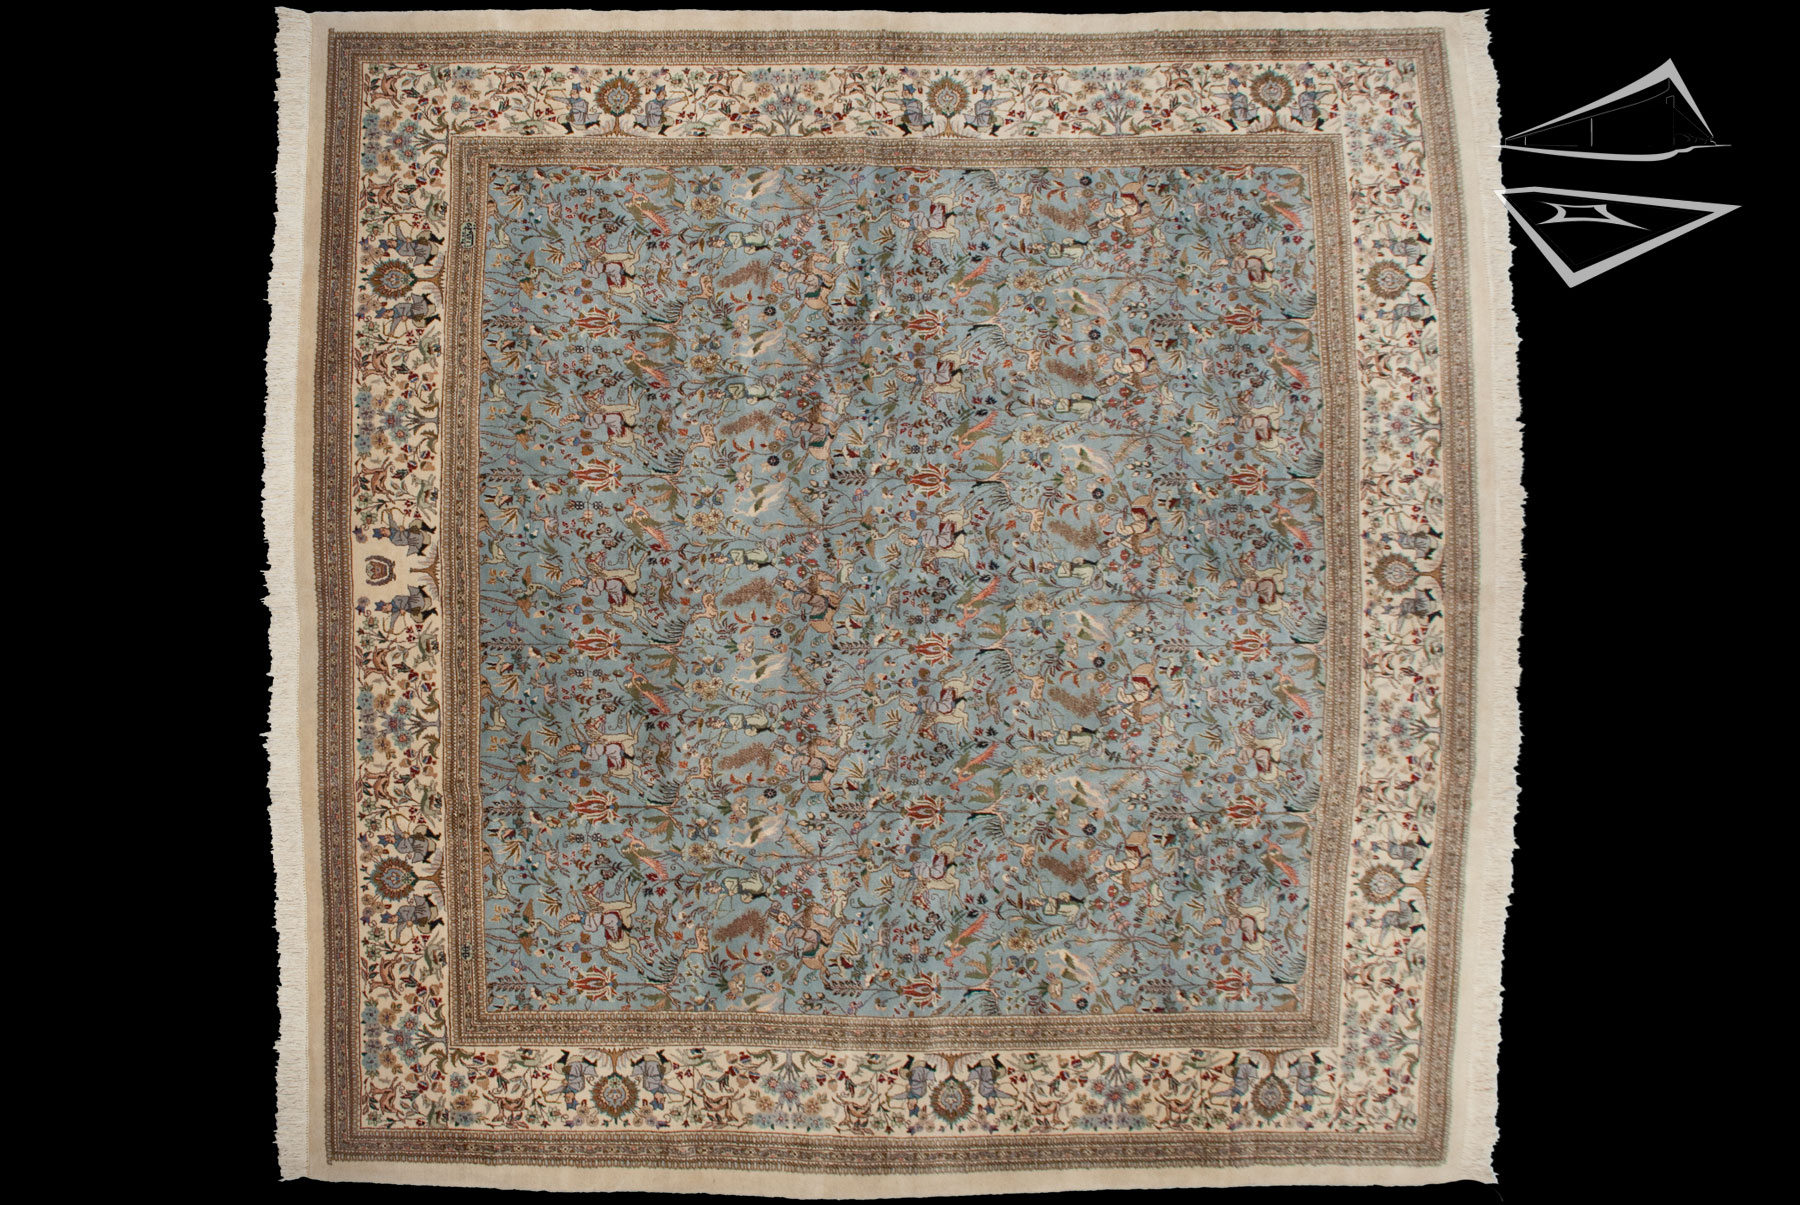 Square Persian Cyrus Crown® Tabriz Rug 12' X 12